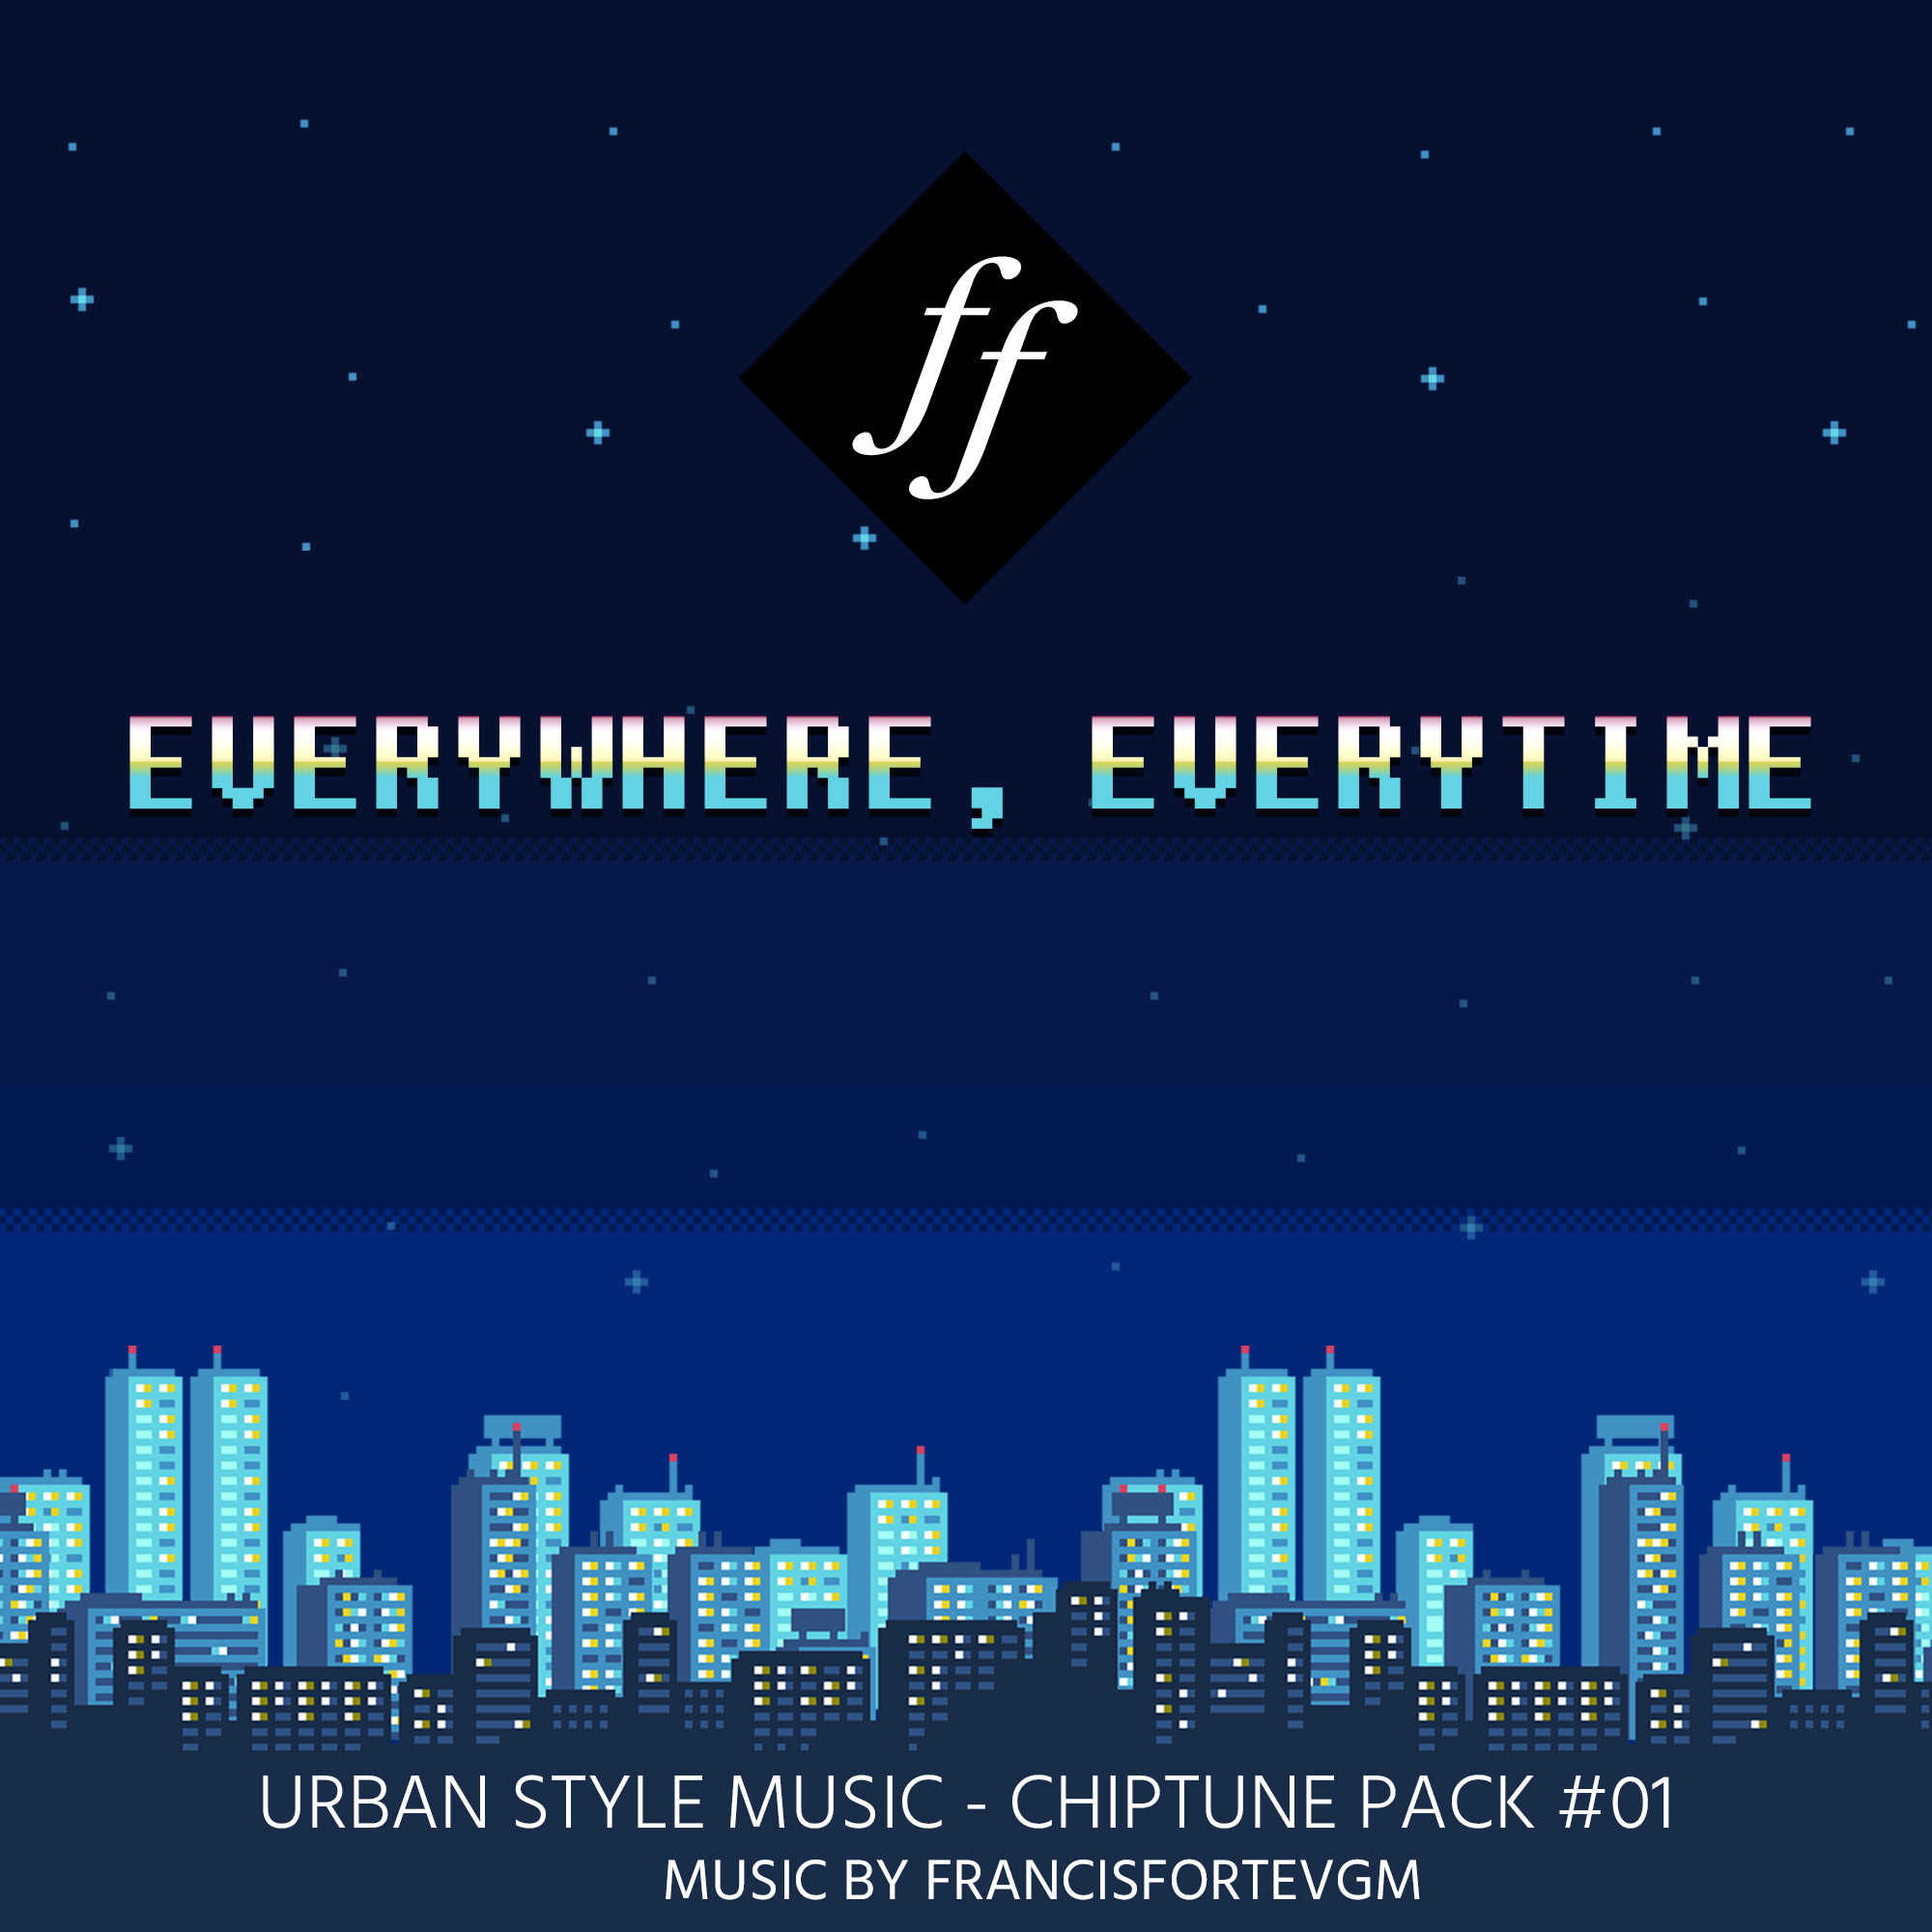 RPG Maker MV - Everywhere, Everytime Music Pack screenshot